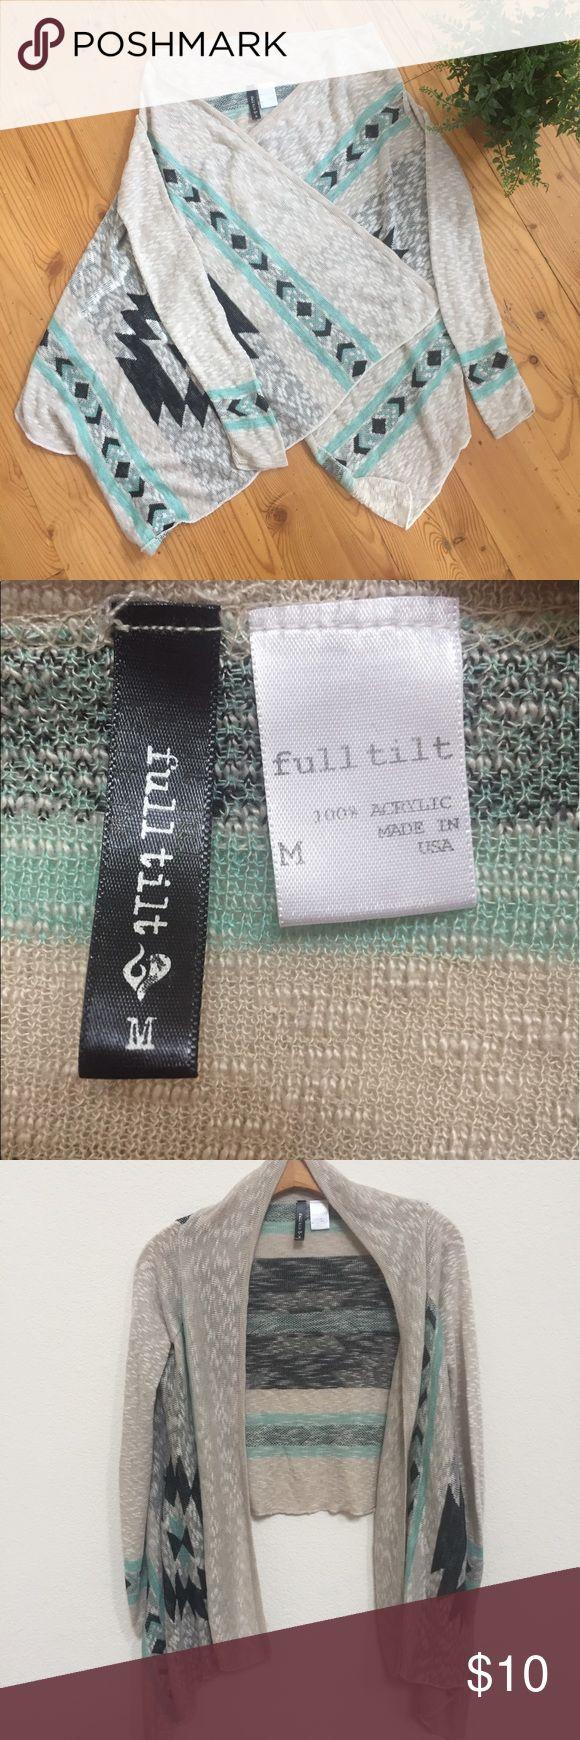 Full Tilt Aztec Prints Cardigan Sz M Pre owned Cardigan , Sz M, length 17, chest 22. It's in good condition. Super cute! Full Tilt Sweaters Cardigans